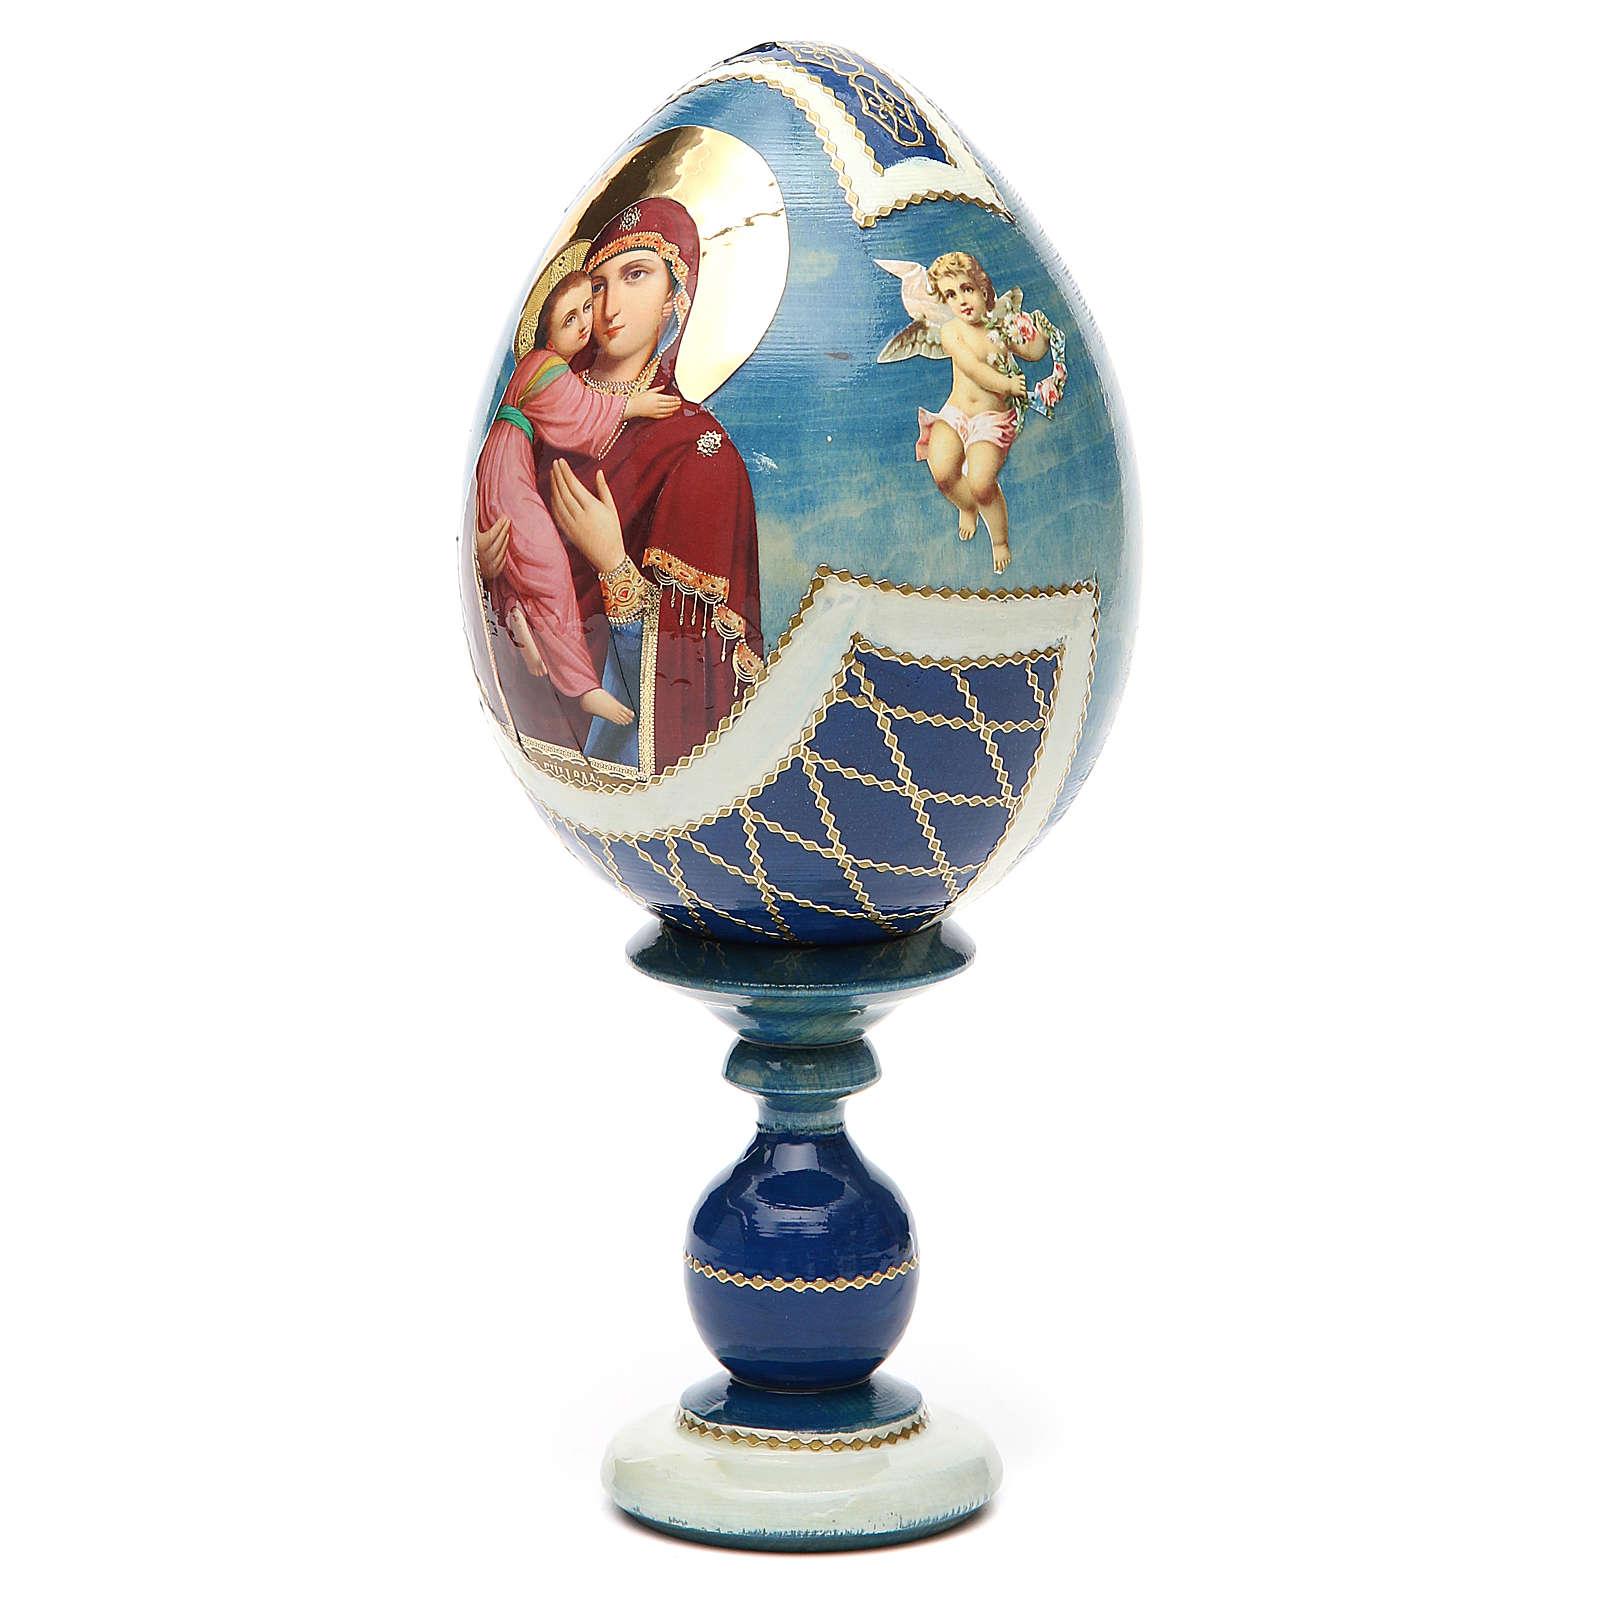 Uovo Russia découpage Vladimirskaya tot h 20 cm stile Fabergè 4